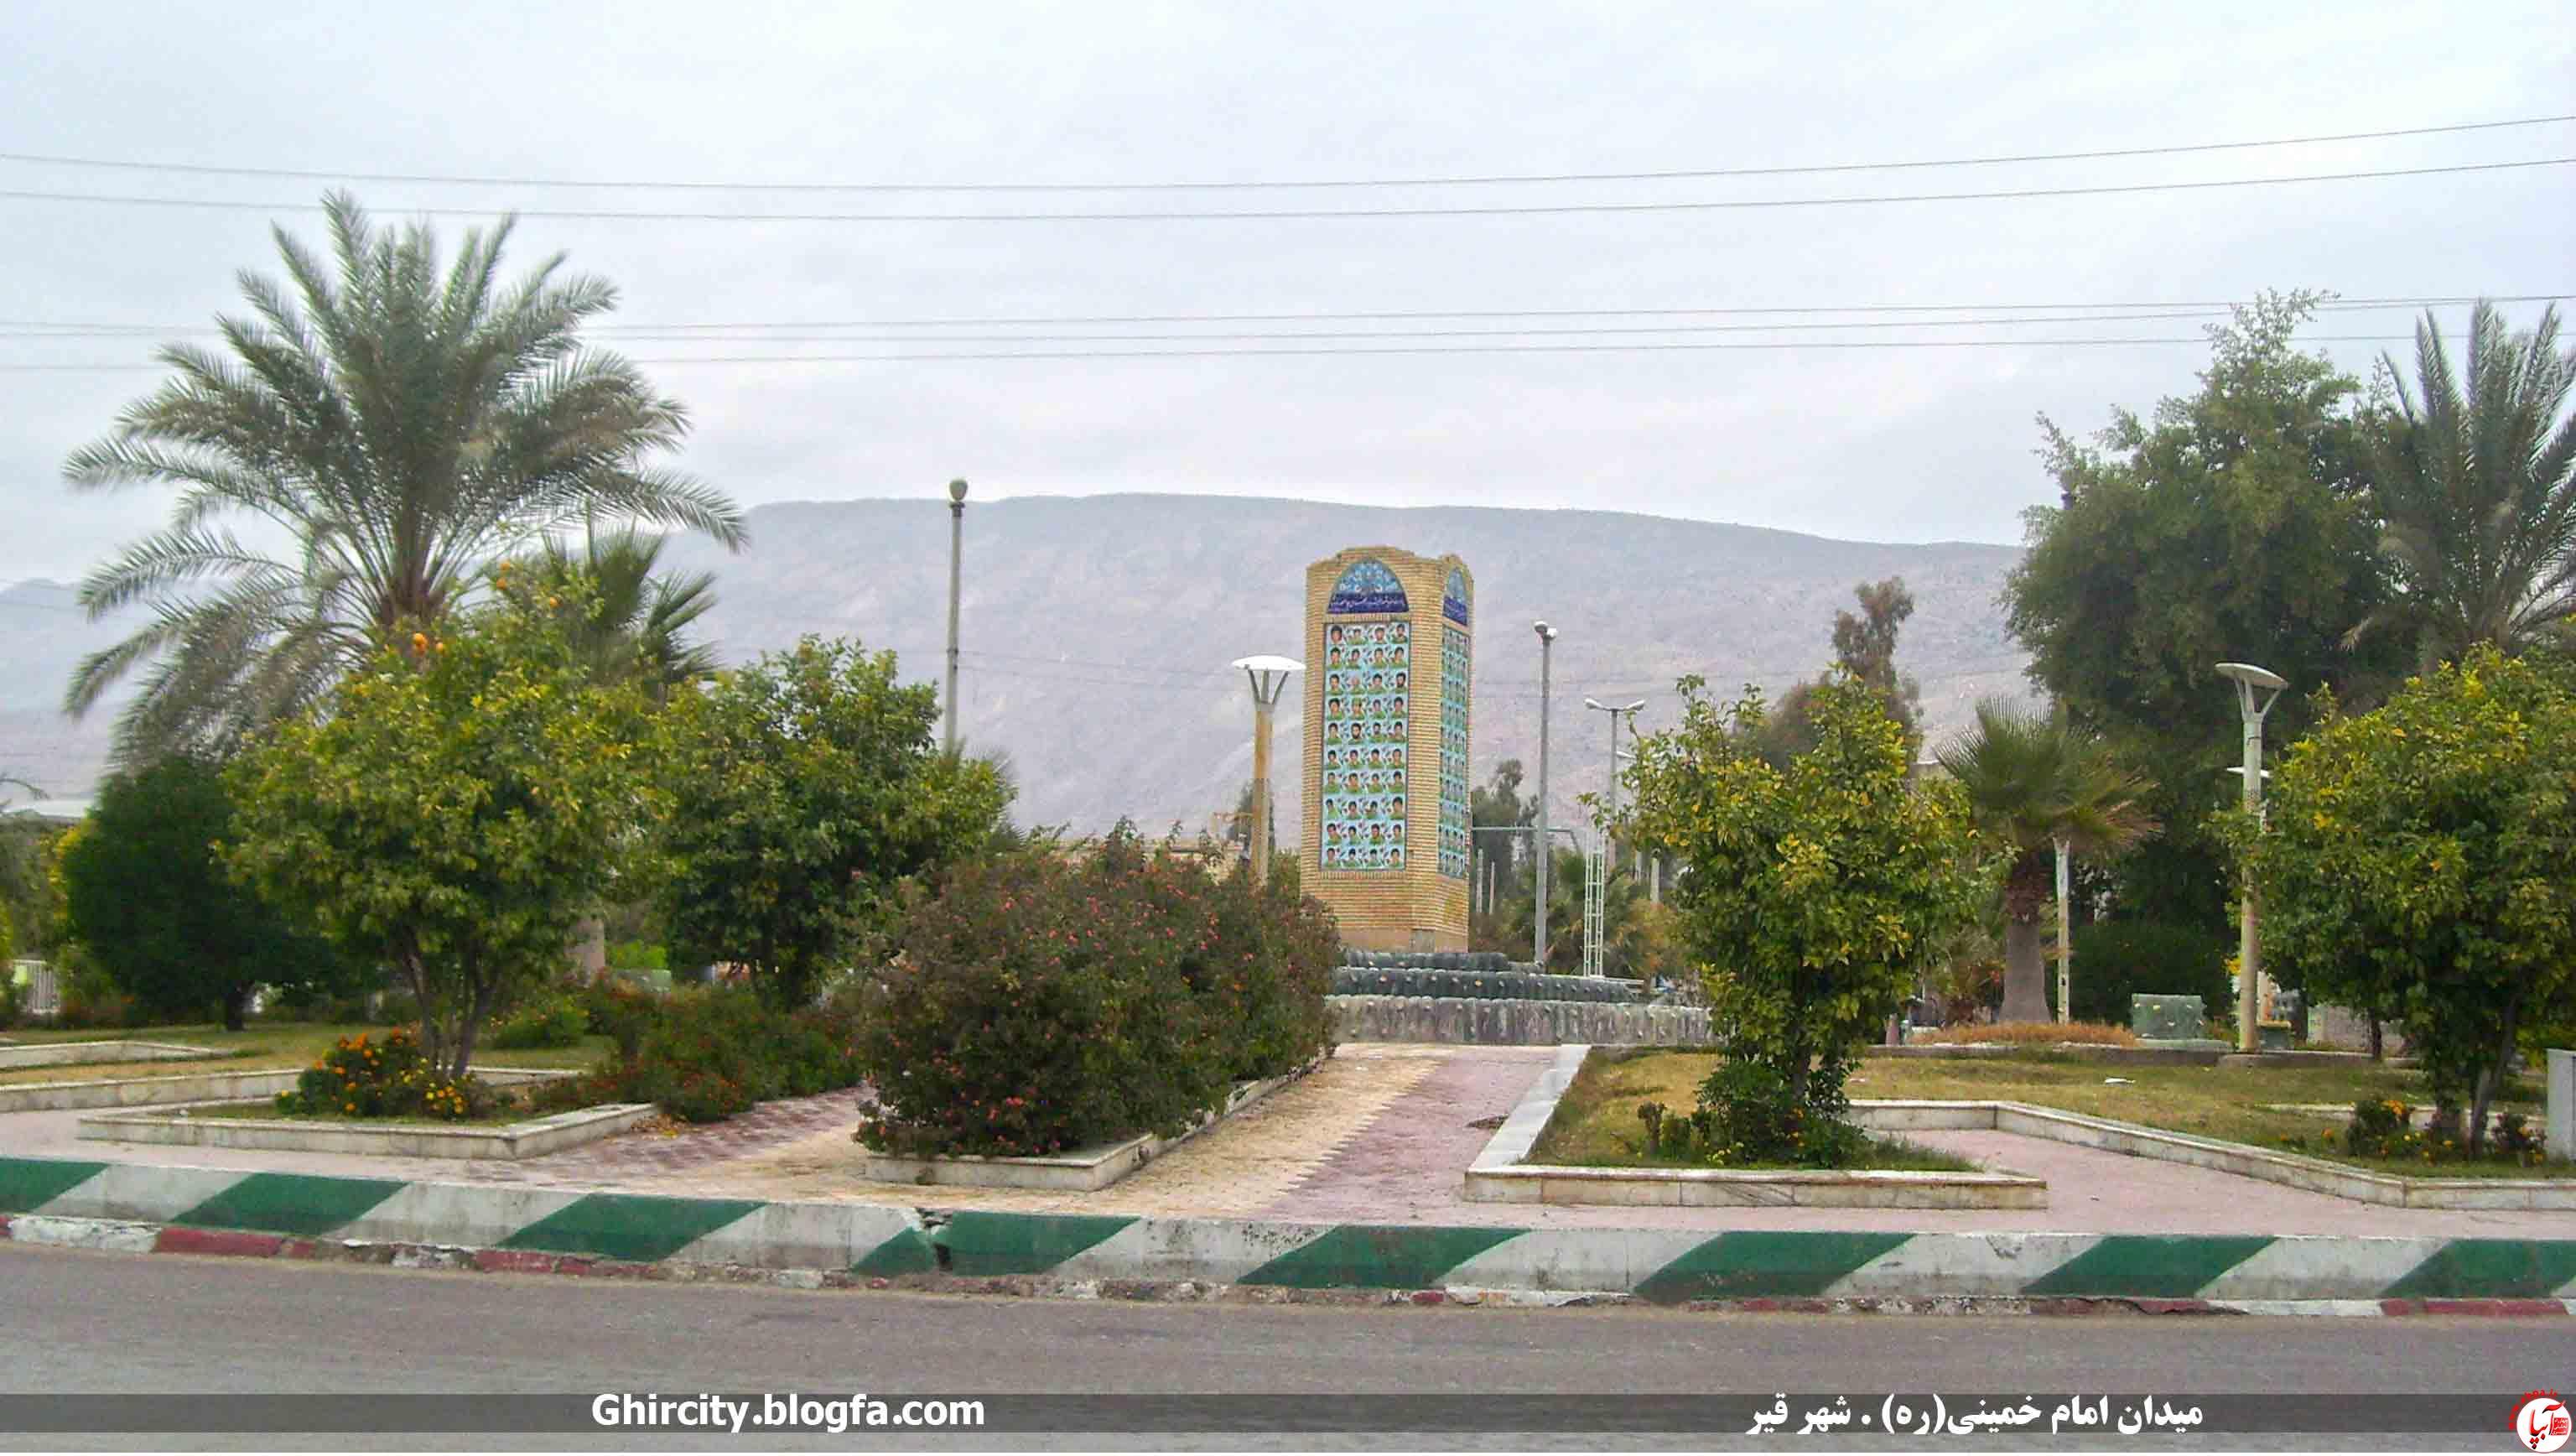 Meydan-Emam-4 برگزاری همایش بزرگ شوراهای شهرستانهای فارس در قیروکارزین